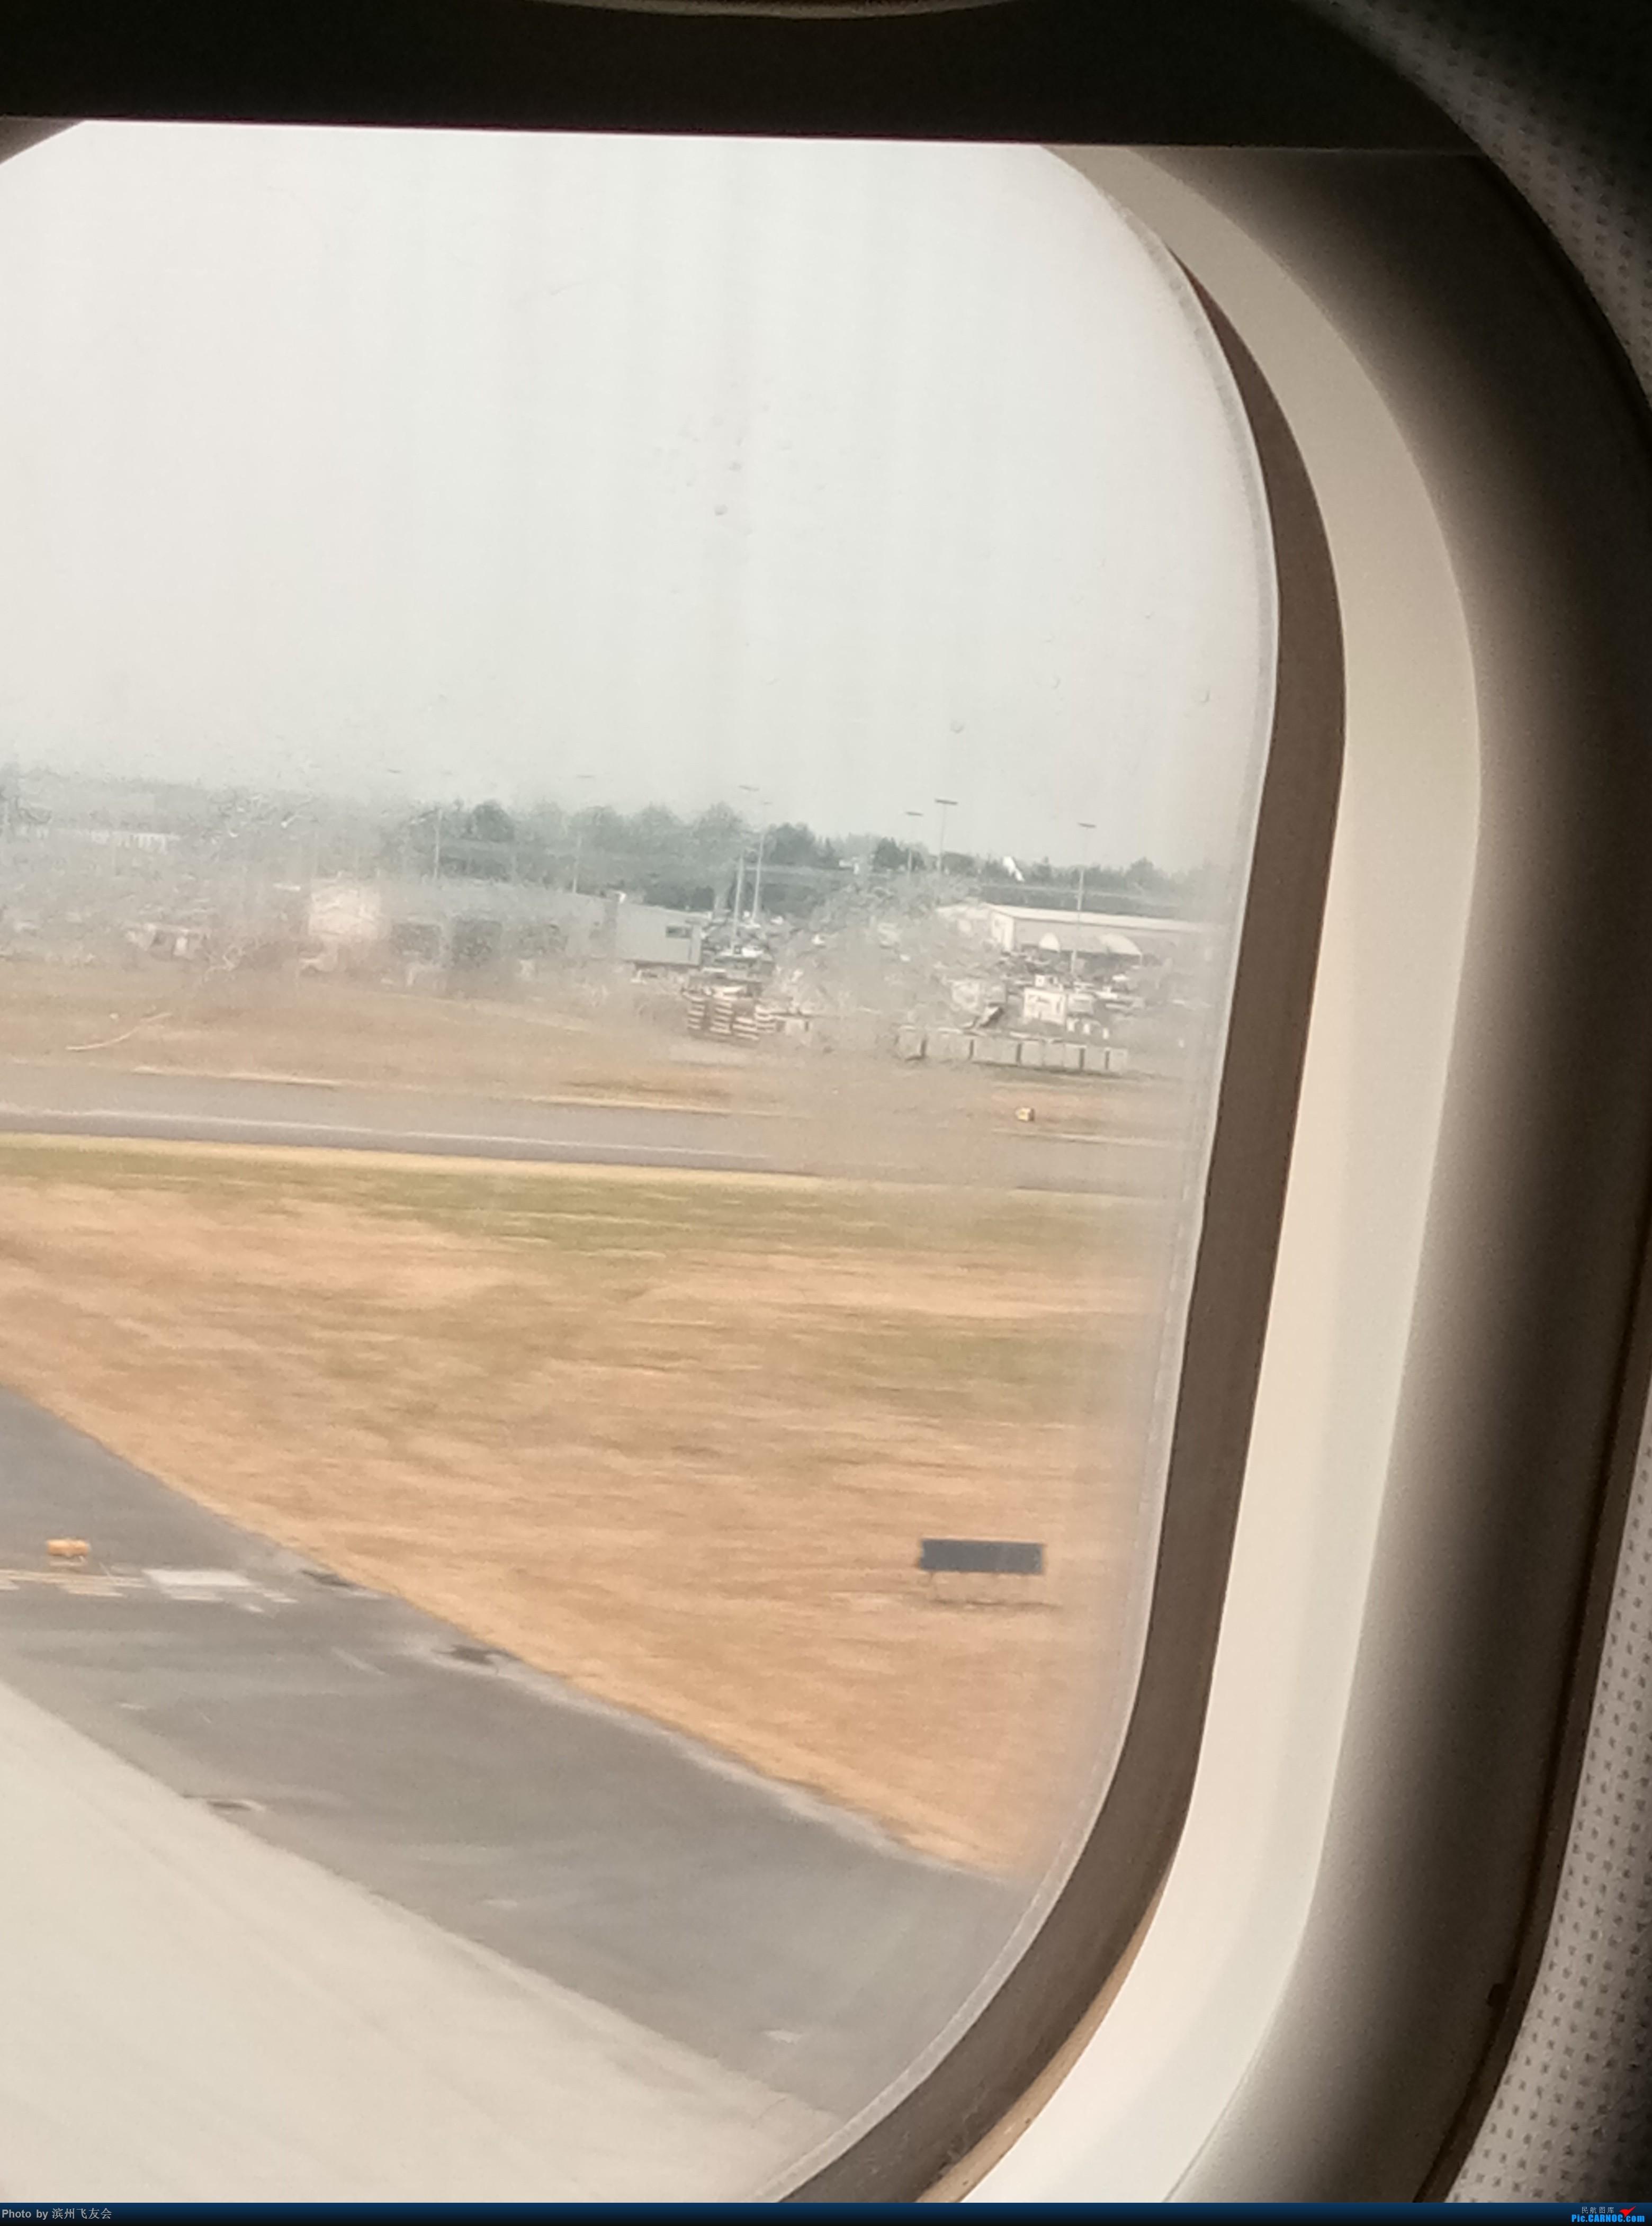 Re:[原创]逐梦路上――带你见识一个不一样的温哥华~ AIRBUS A330-300 B-5978 加拿大温哥华机场